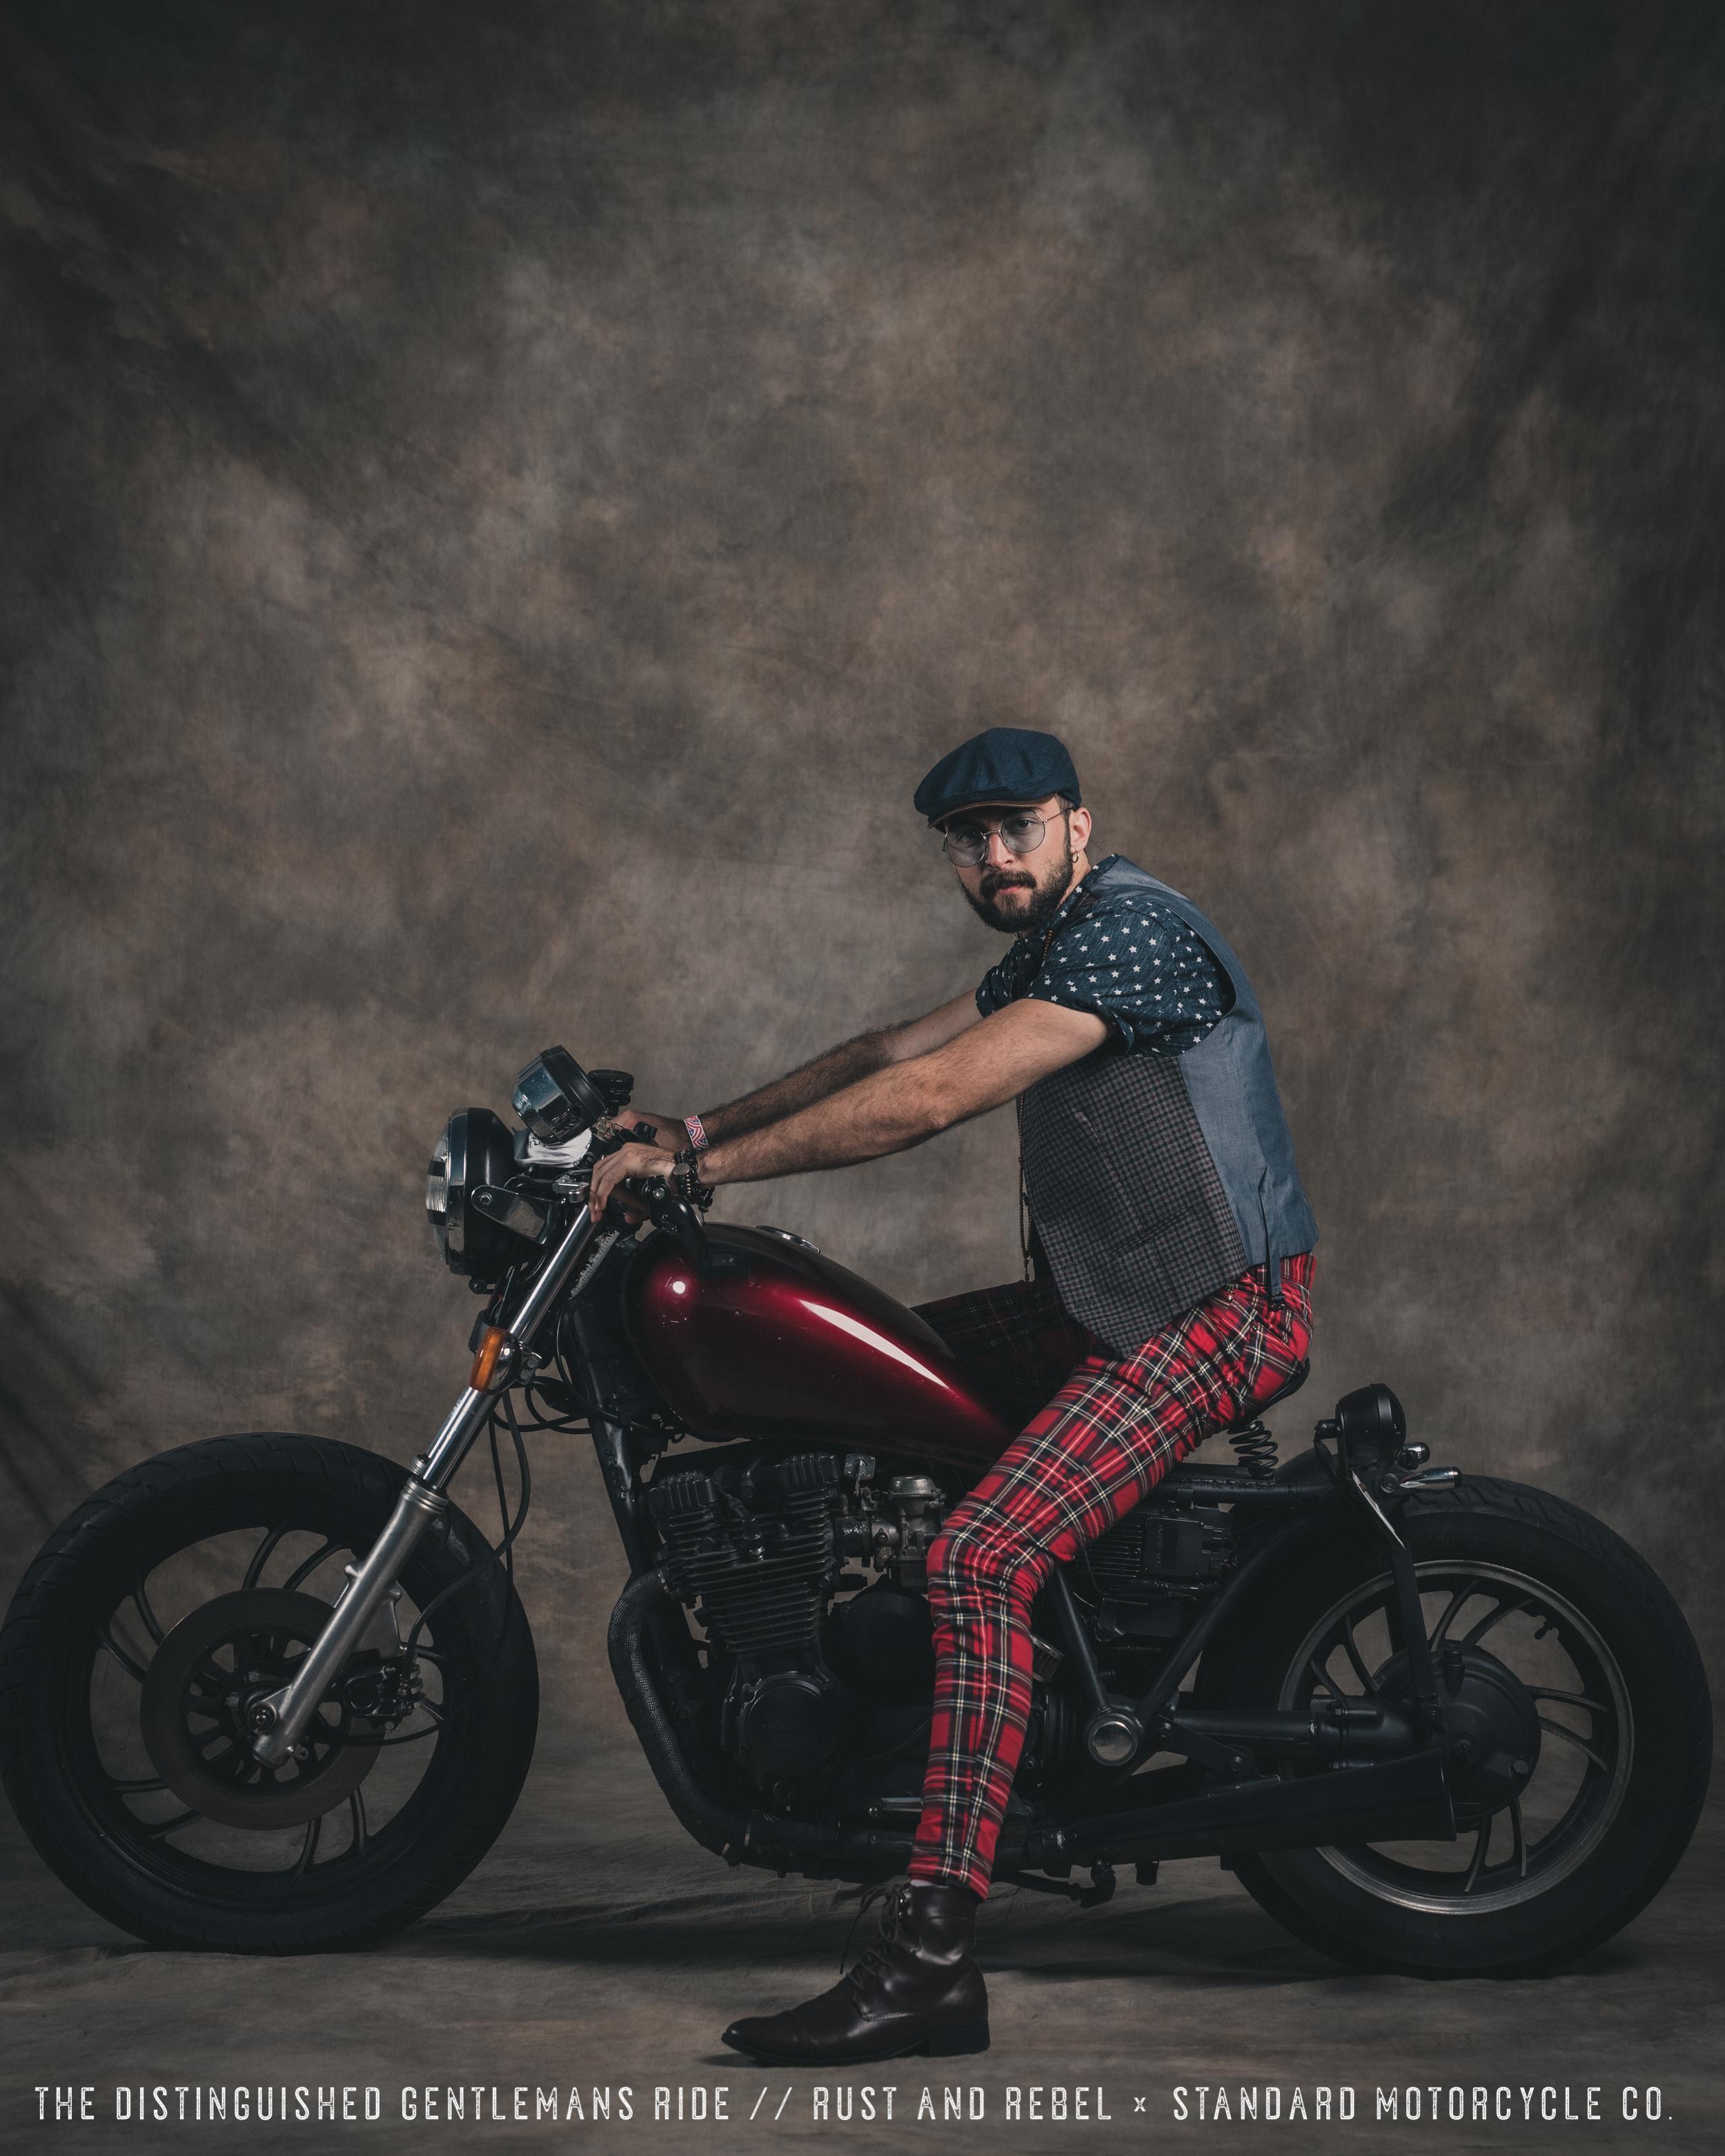 The Distinguished Gentleman's Ride 2019 [PEOPLE - PHOTO BY @MIKEDUNNUSA] - 0153.jpg